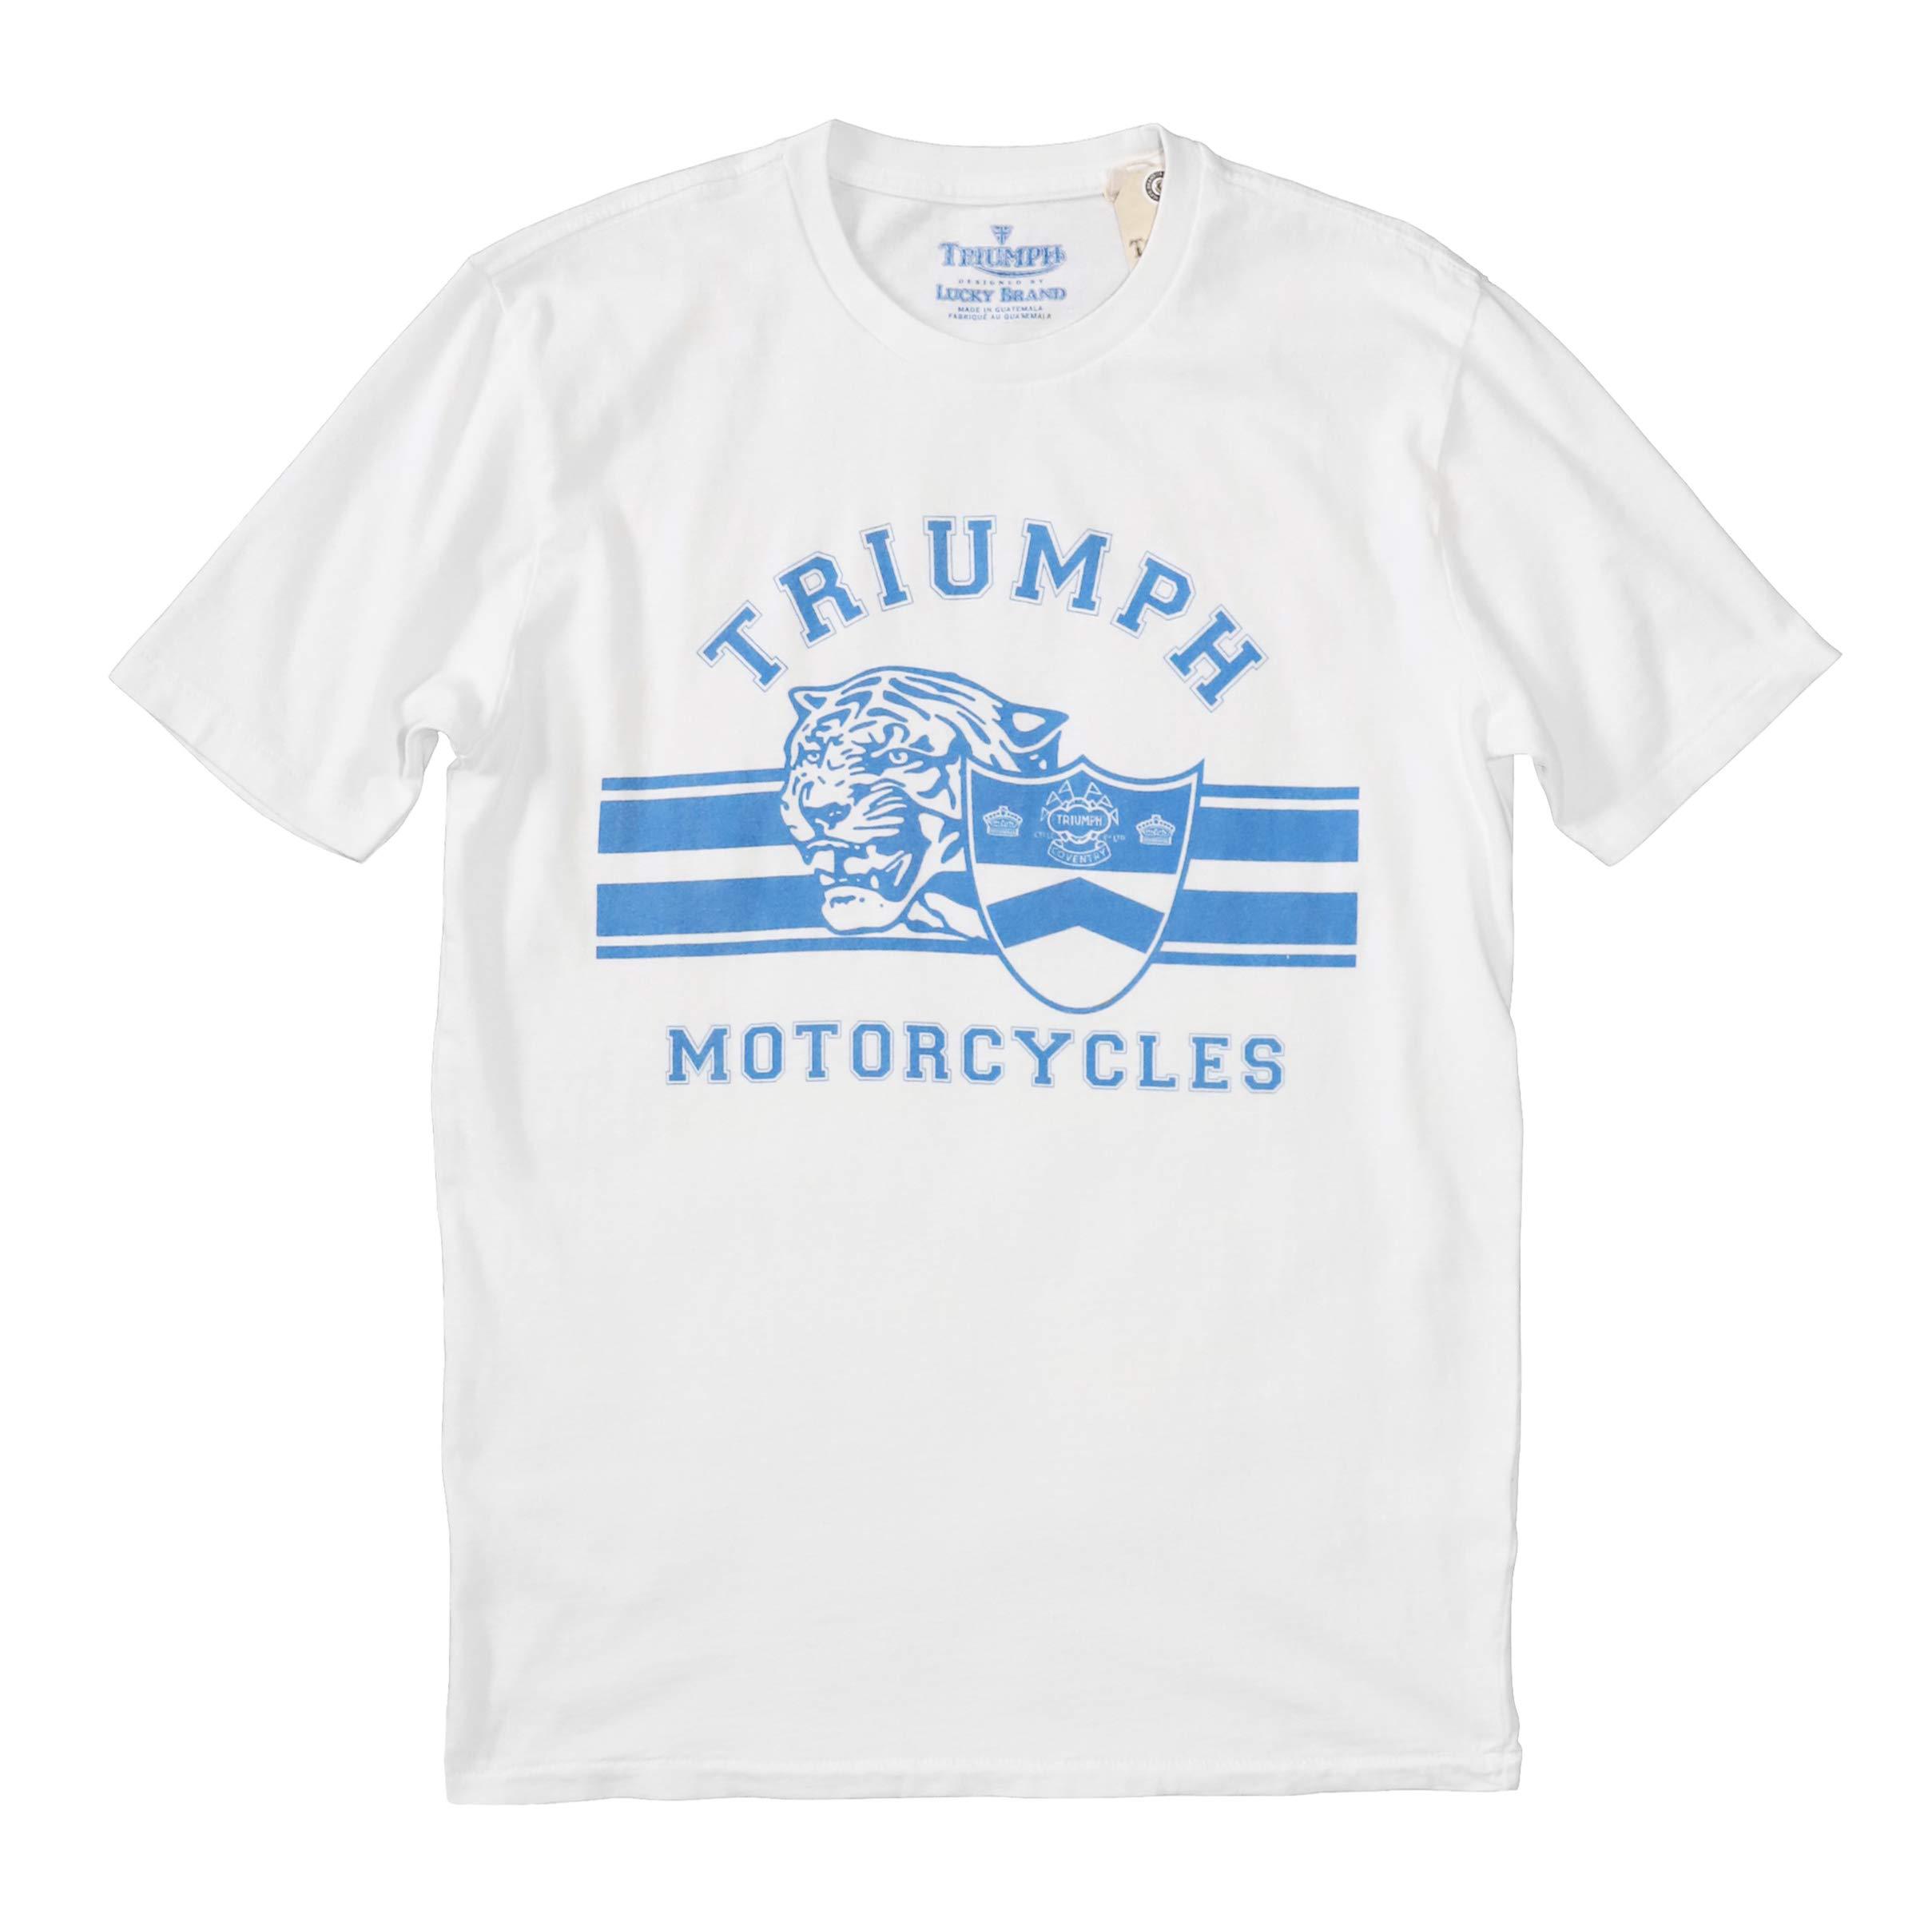 Lucky Brand Men's White Triumph Motorcycle Logo Tee (Medium)